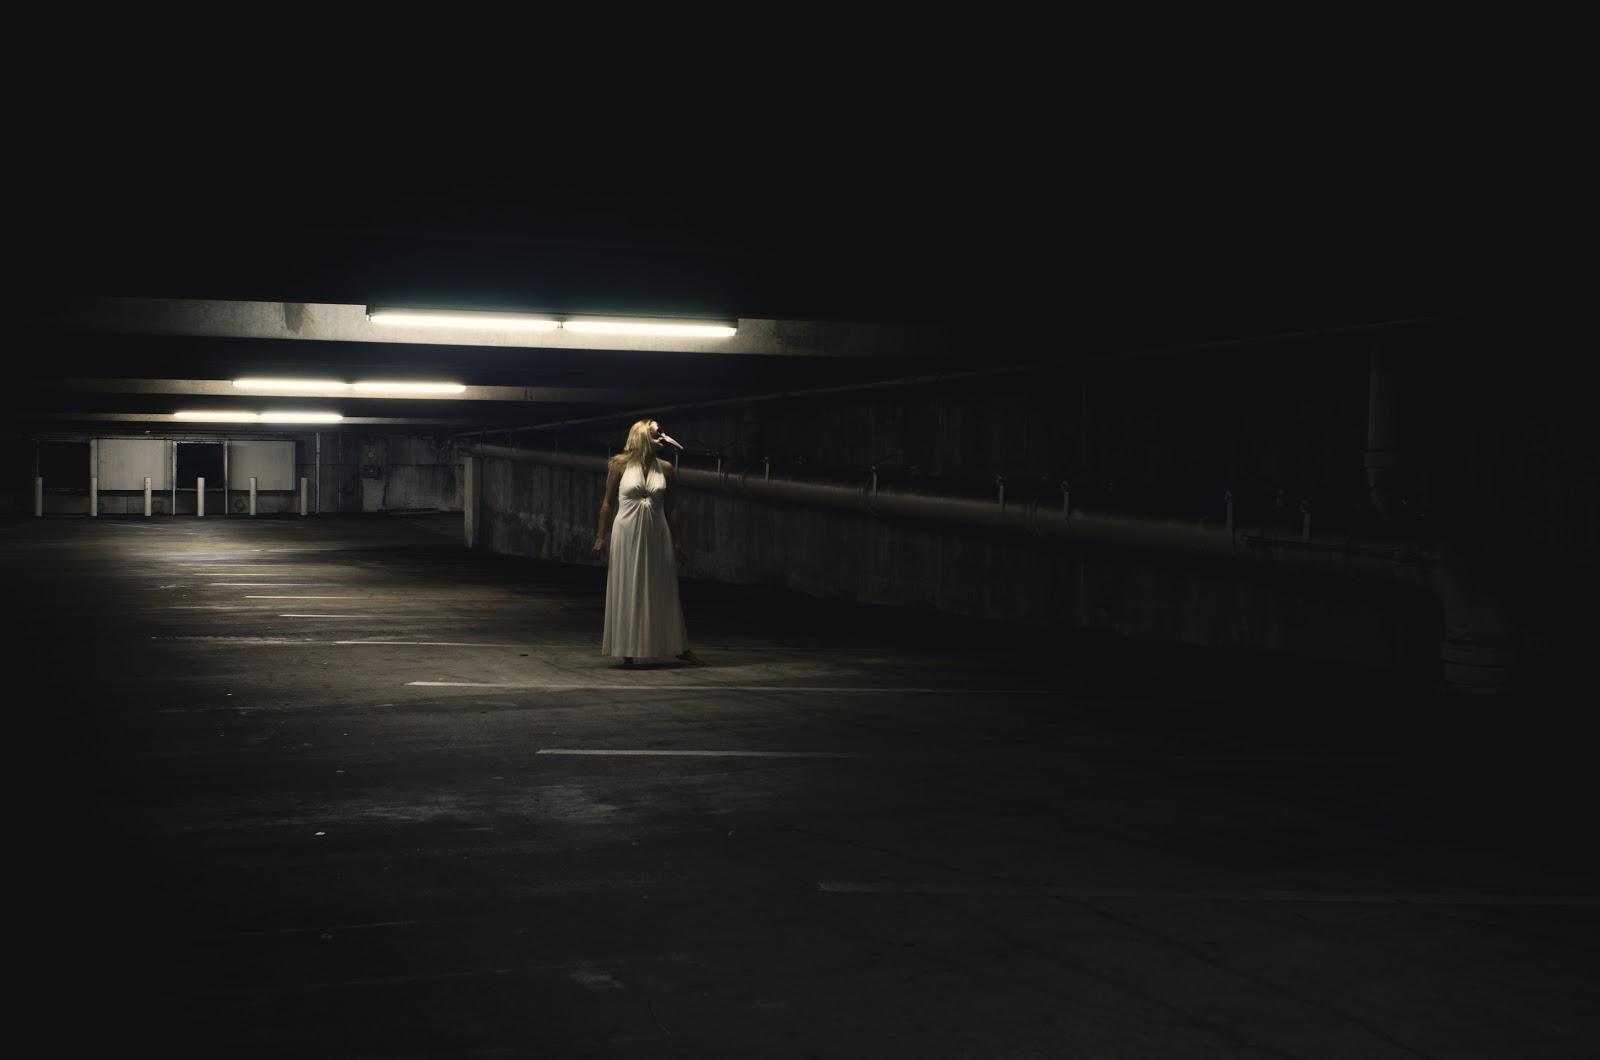 Dark Spooky Car Park